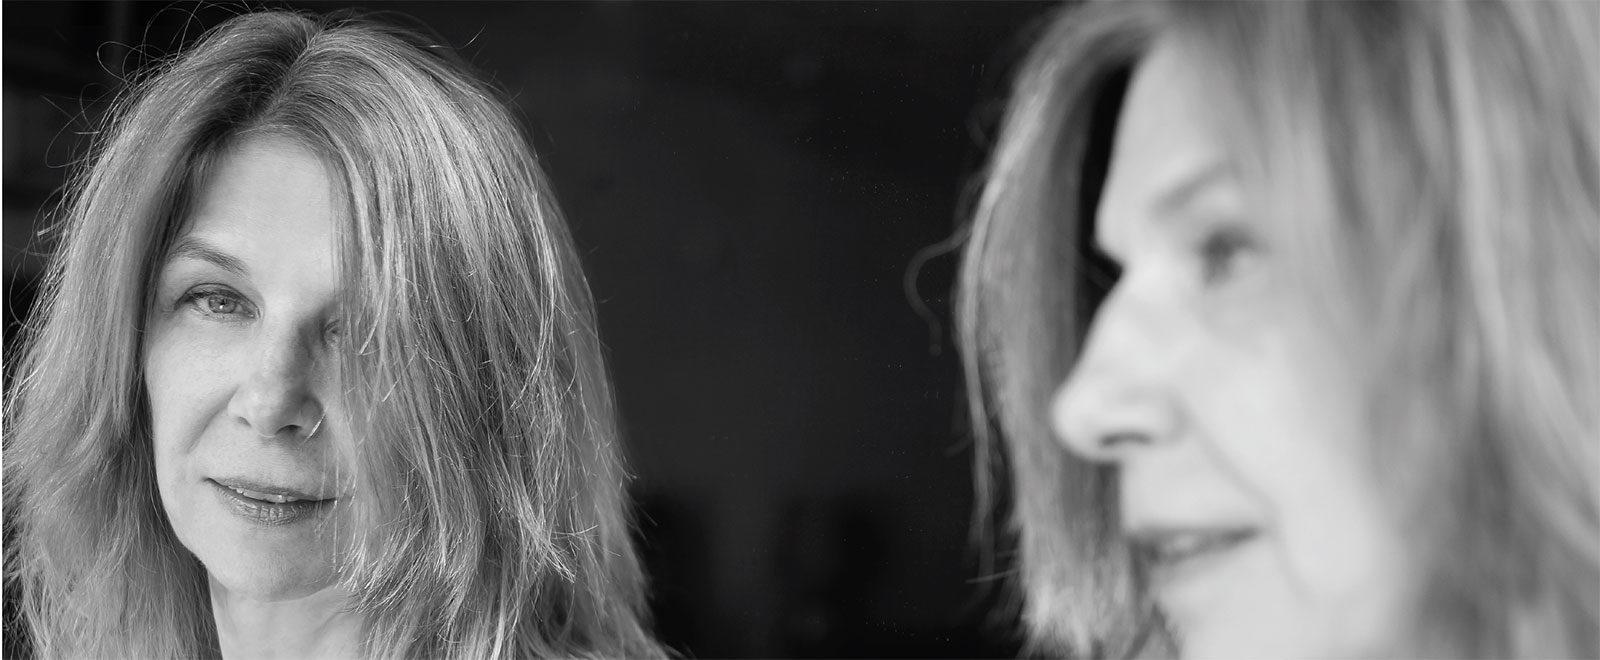 Sara Driver Filmmaker Basquiat